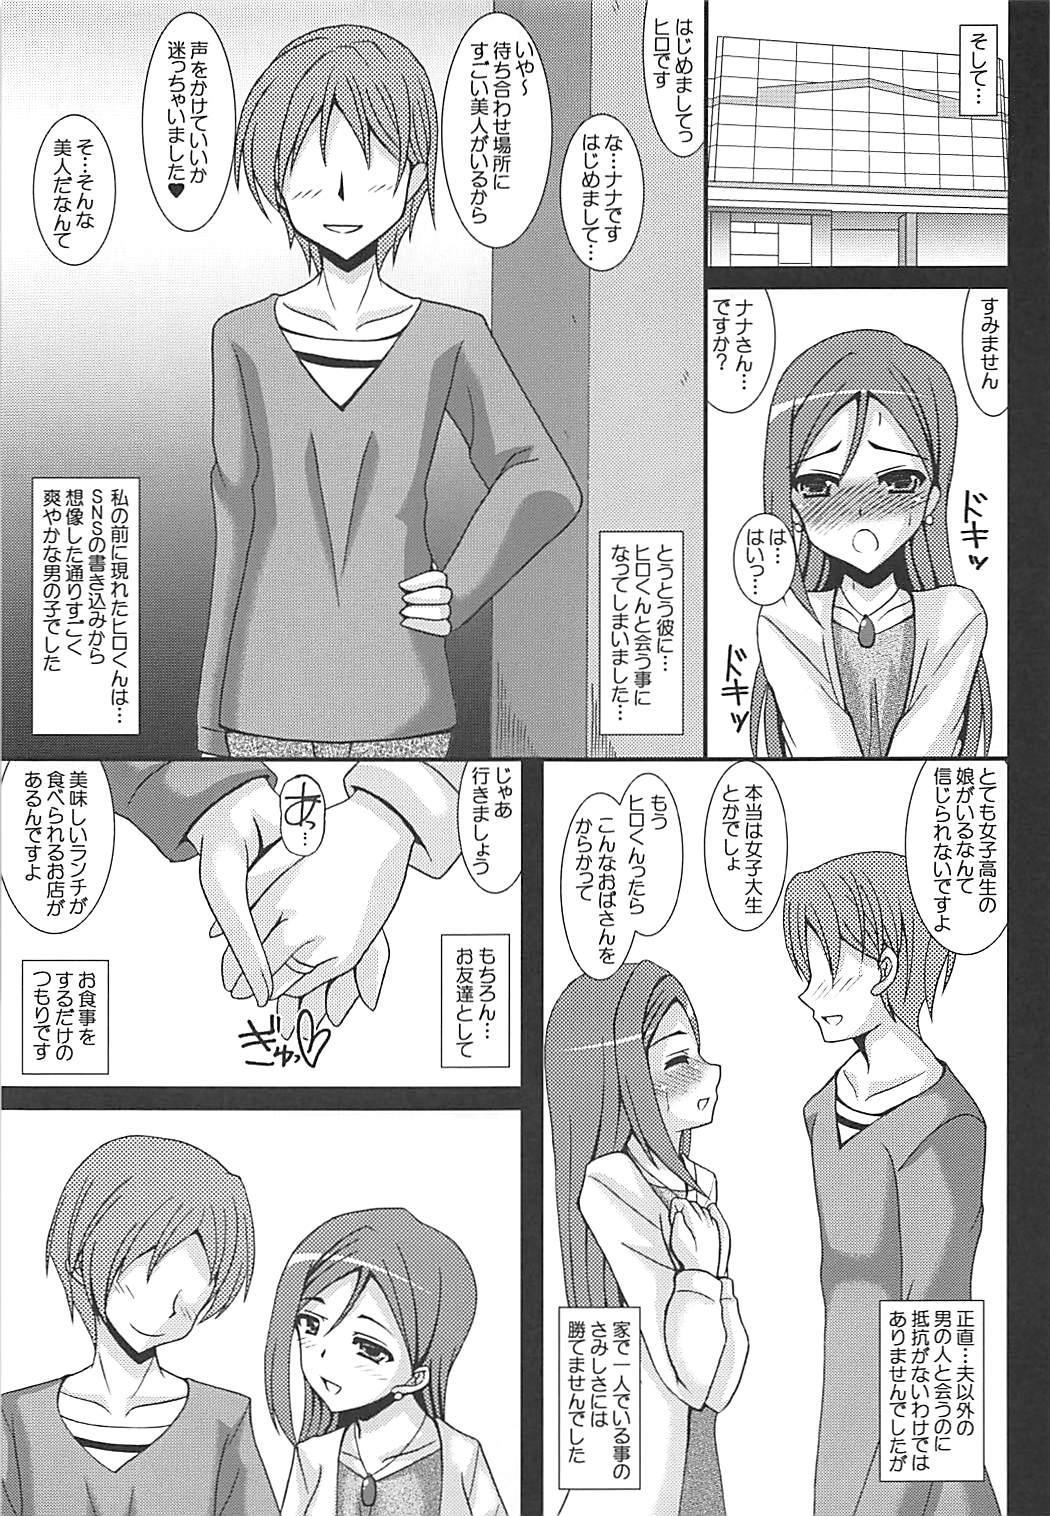 (COMIC1☆13) [Kirei na Oneesan (Izumi Yayoi)] Love Wife! Sunshine!! Sakurauchi-san-chi no Oku-sama no Baai (Love Live! Sunshine!!) 5